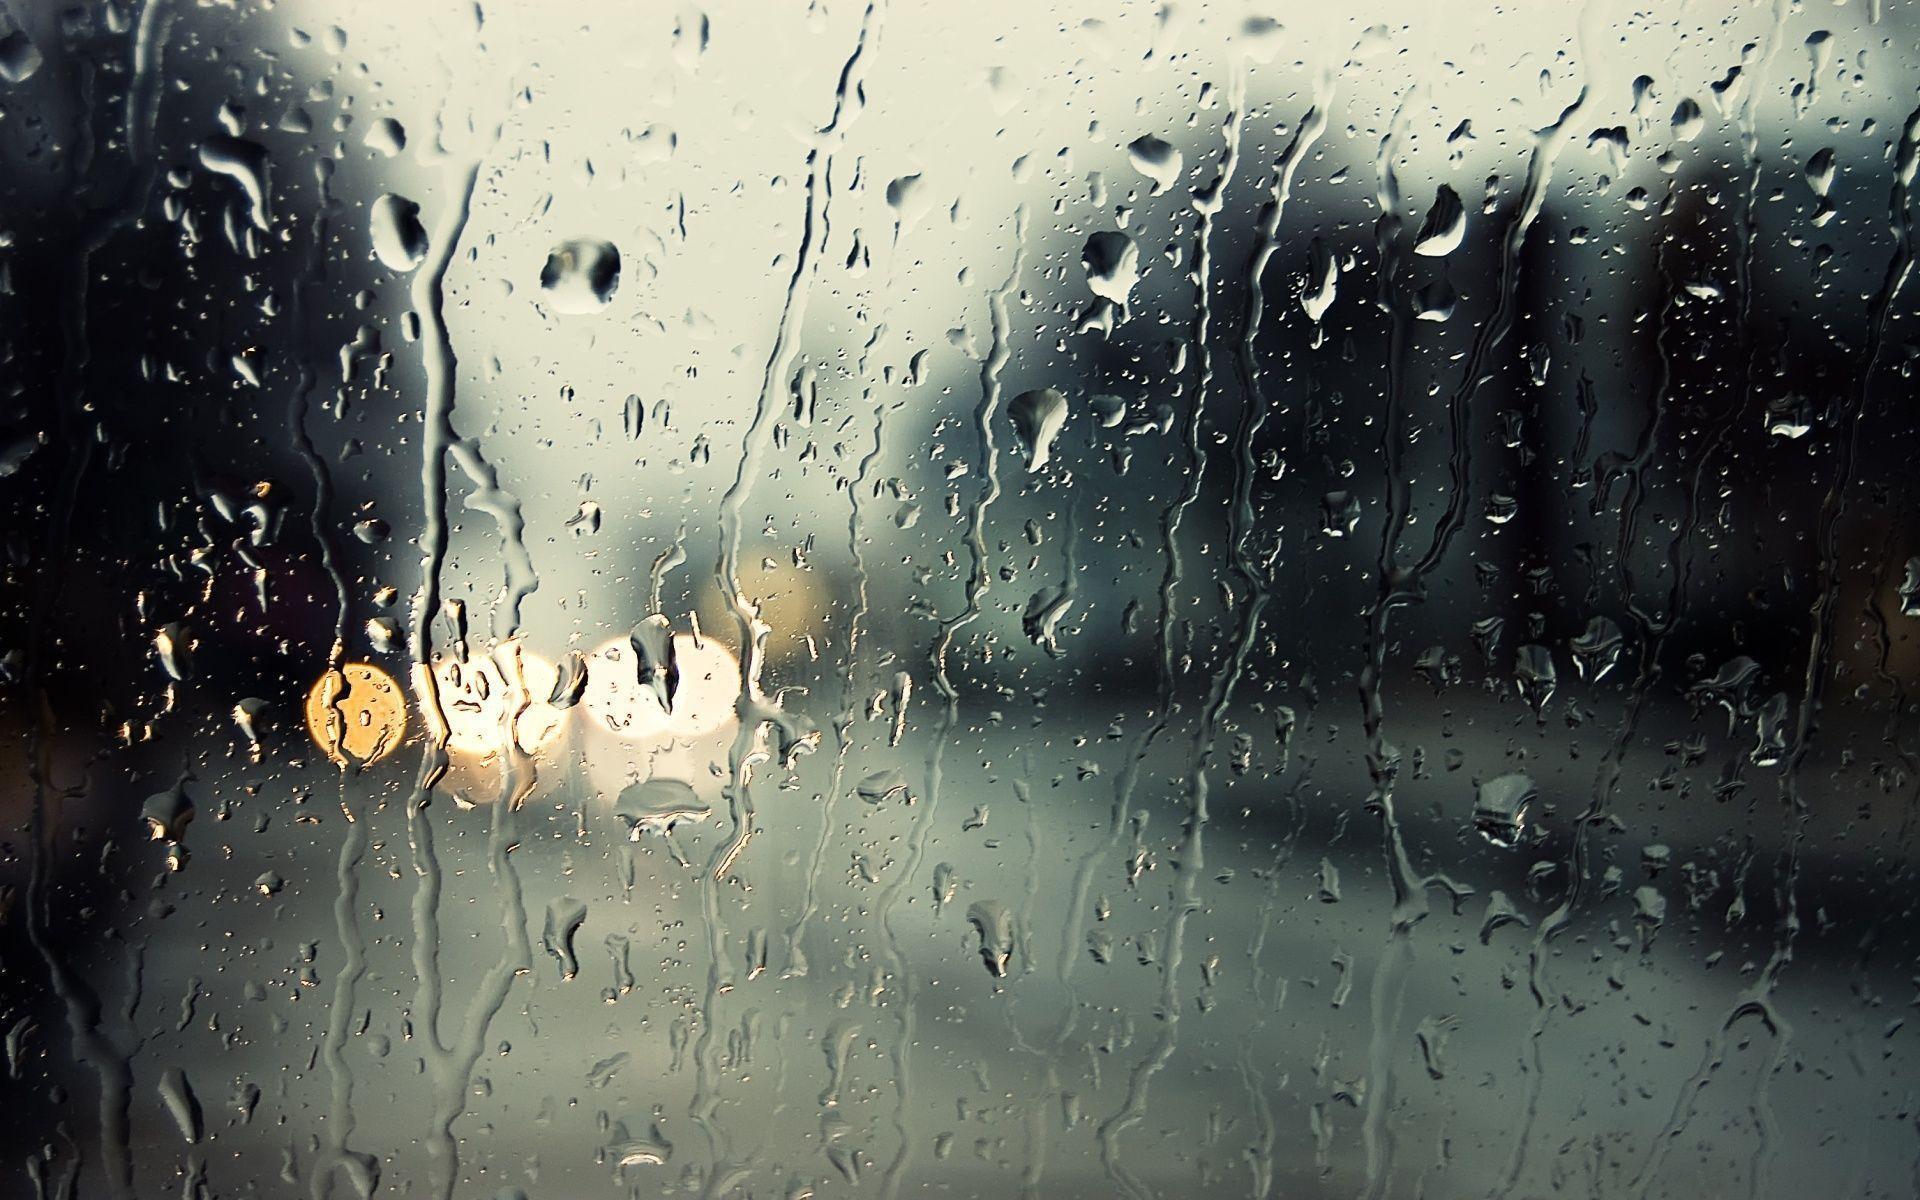 Rain Wallpapers | HD Wallpapers Base